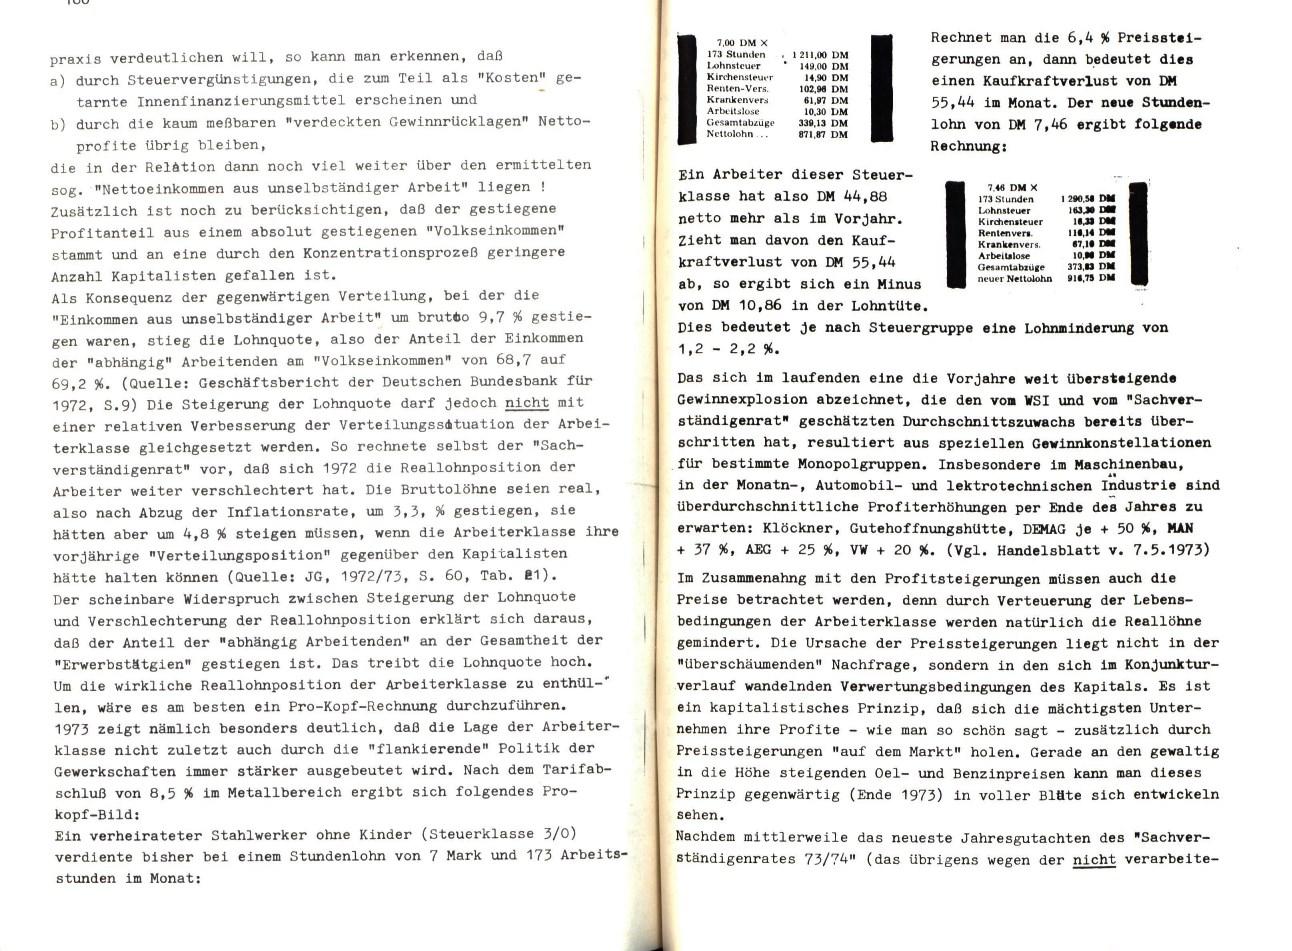 Bochum_IGM_Opel_PG_Opel_streikt_1973_083